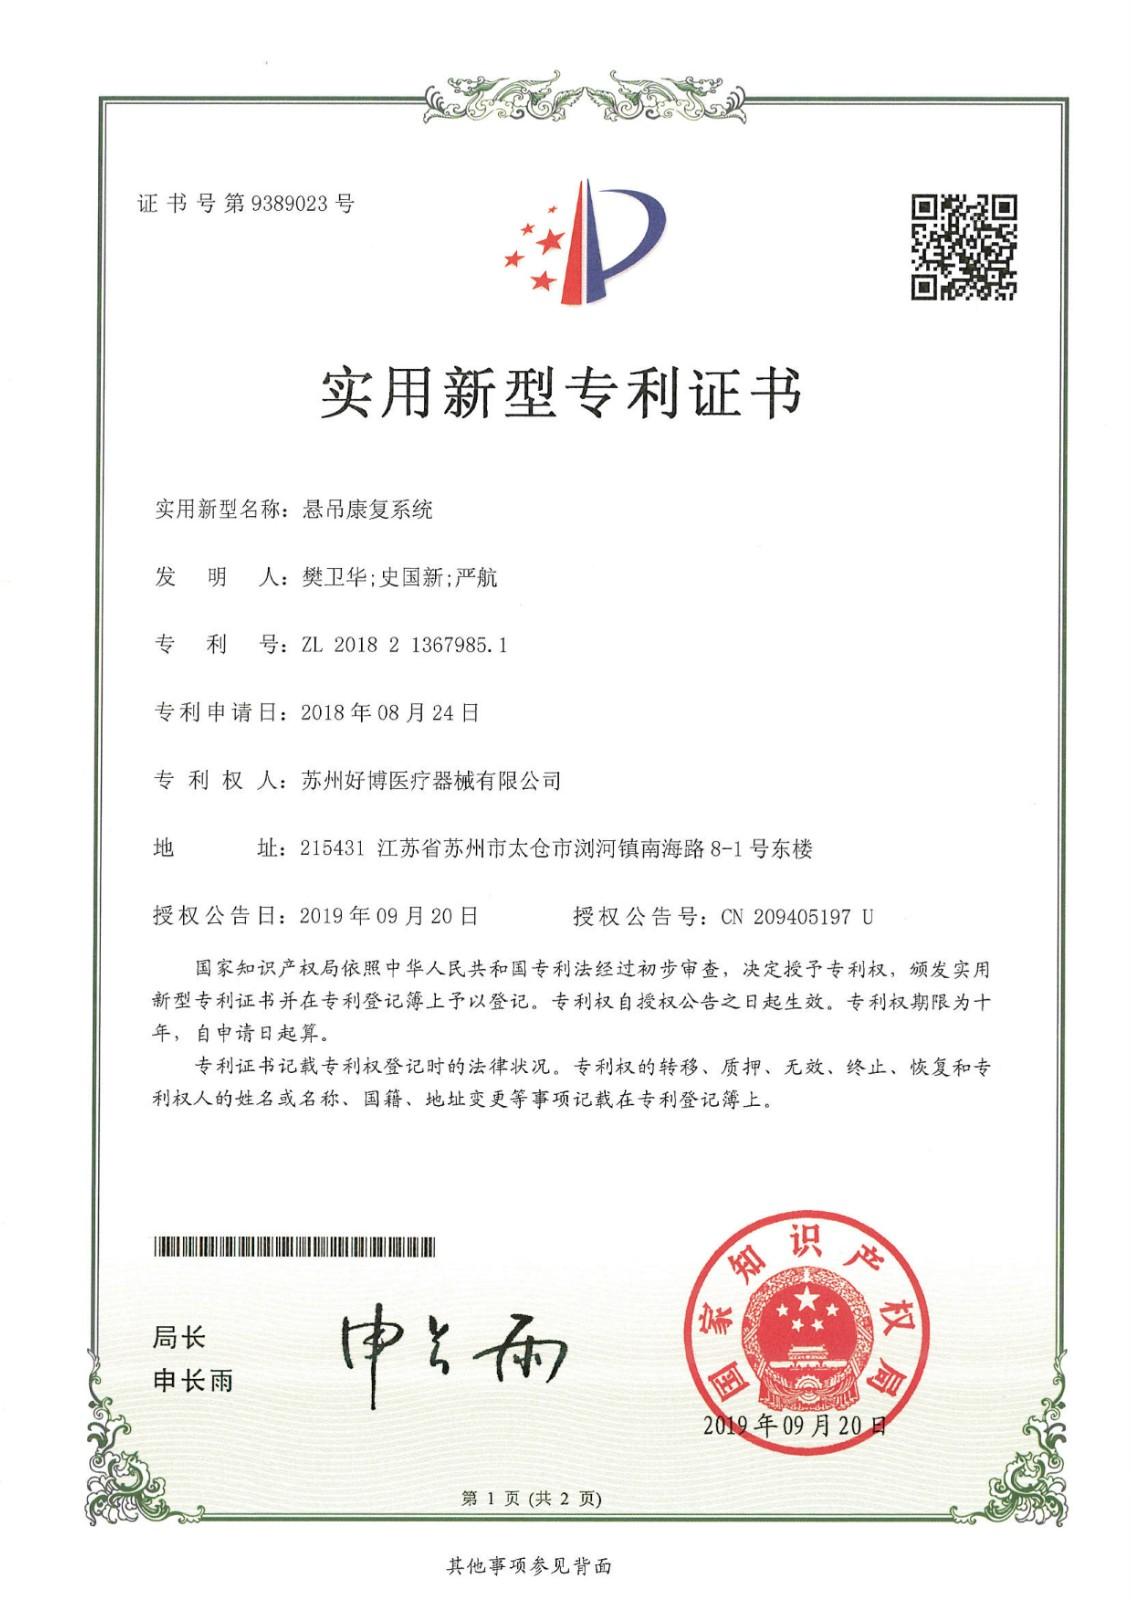 A-018-35 实用新型专利证书 悬吊康复系统 (证书号第9389023号)-1修改后.jpg